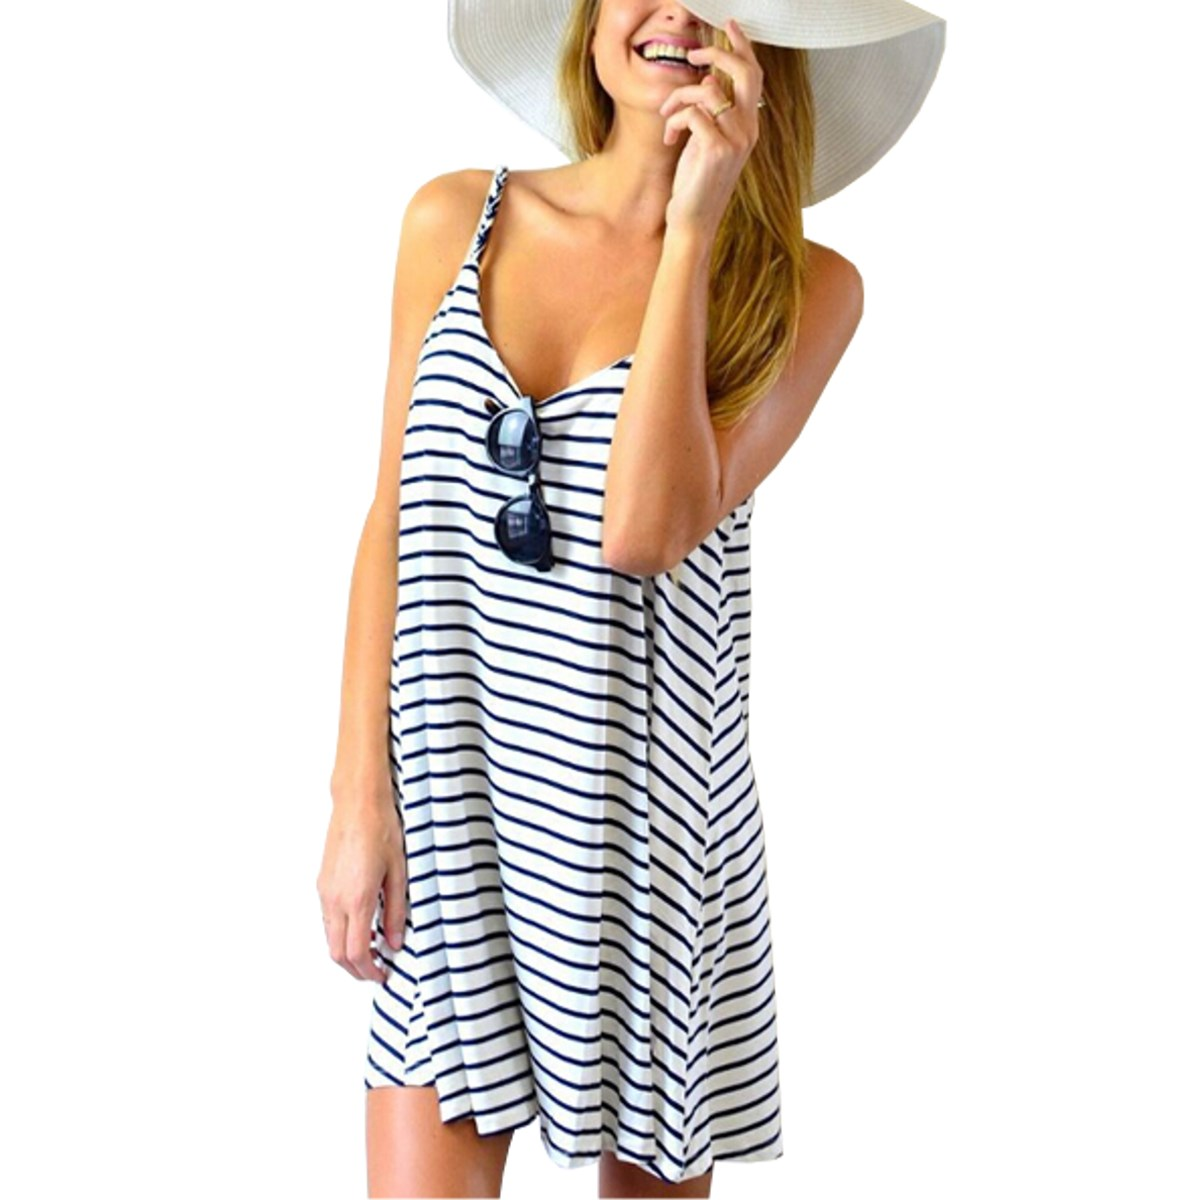 Plus Size S-3XL Summer Style Women Dress 2016 Ladies Strap Stripe Sleeveless Sexy Mini Dress Casual Beach Mini Dresses Vestidos